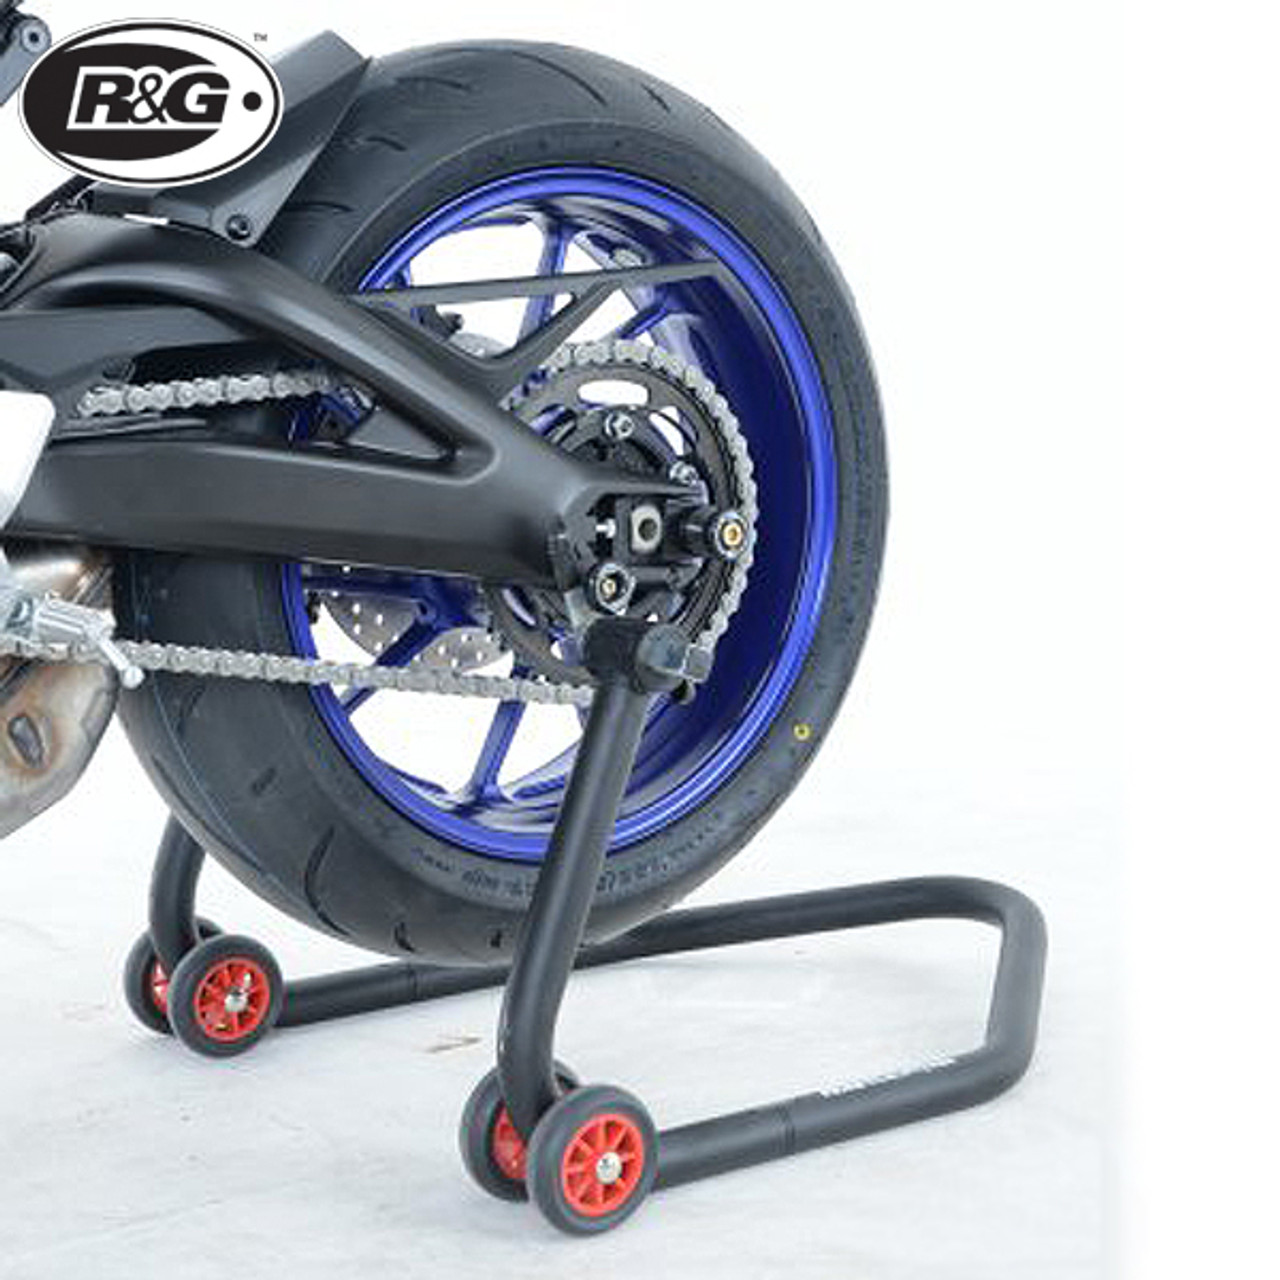 R G Racing Yamaha Fz1 06 15 M6 Cotton Reel Swingarm Spools